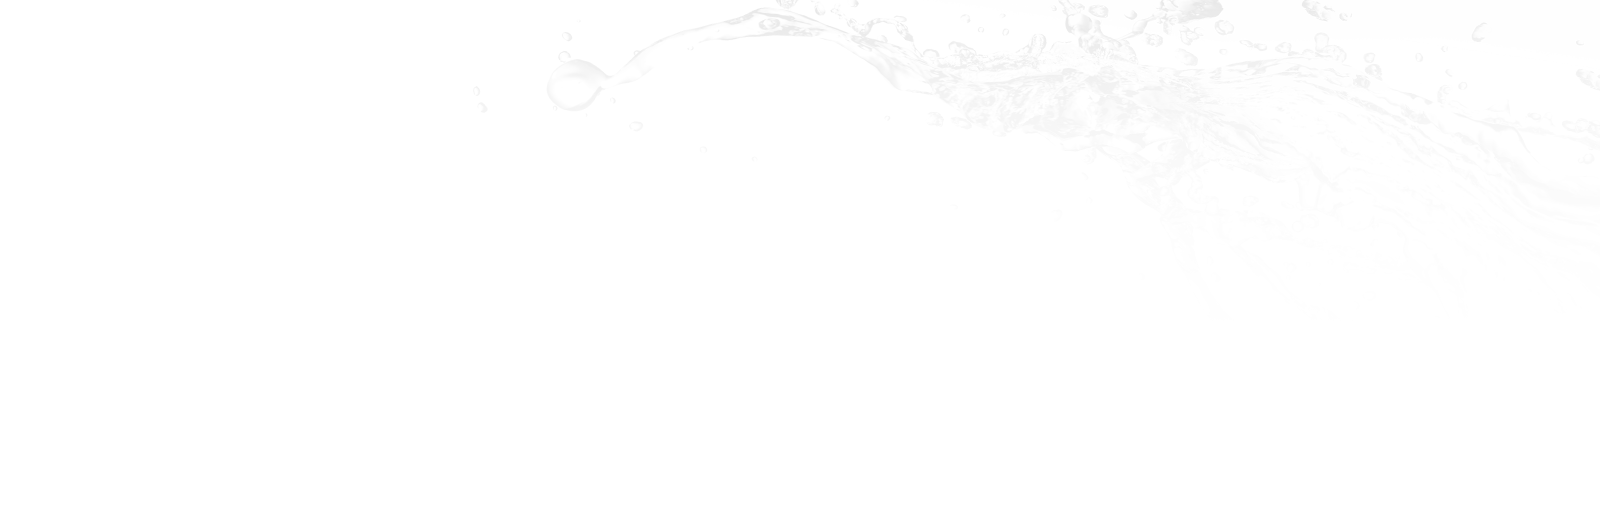 Крапли воды